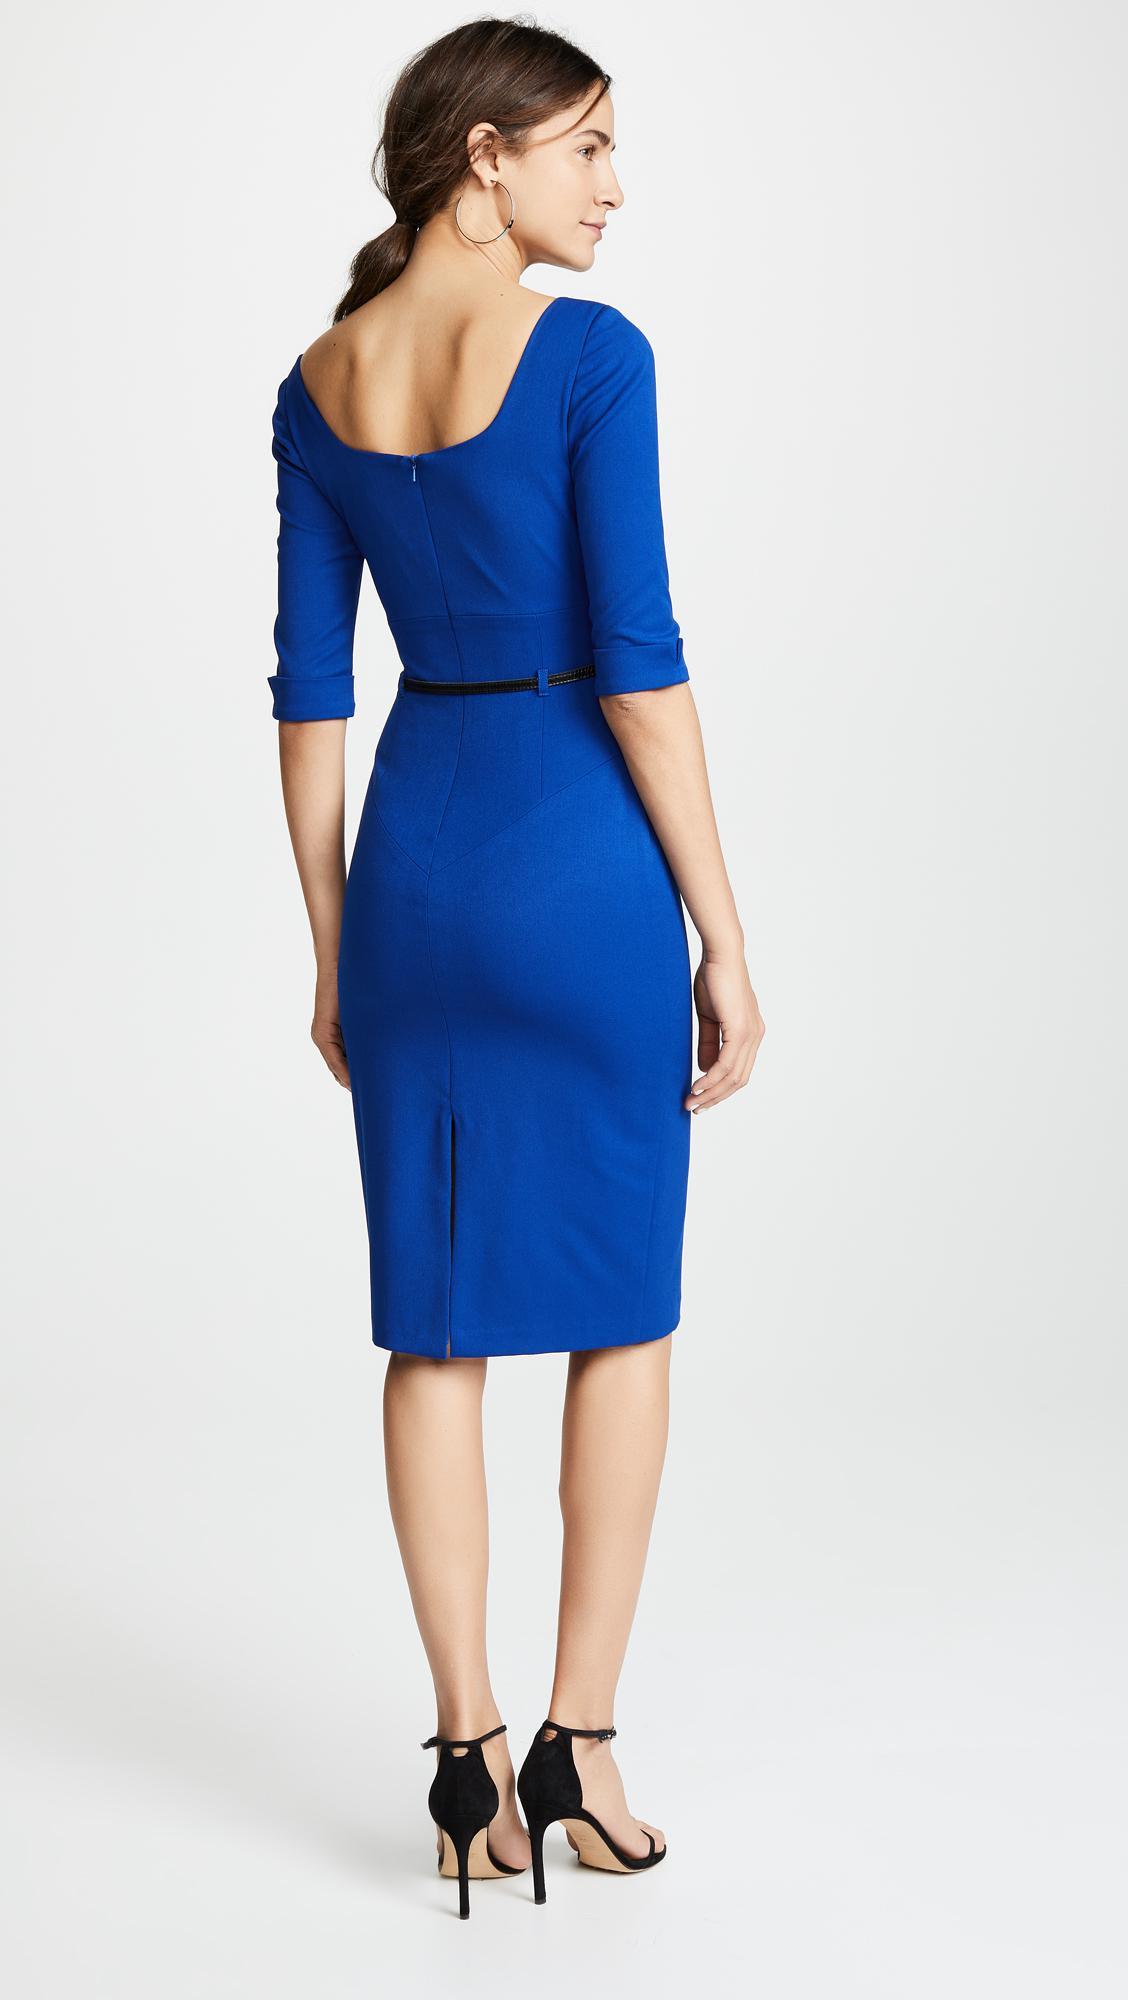 b8a2f5466d Black Halo - Blue 3 4 Sleeve Jackie O Dress - Lyst. View fullscreen